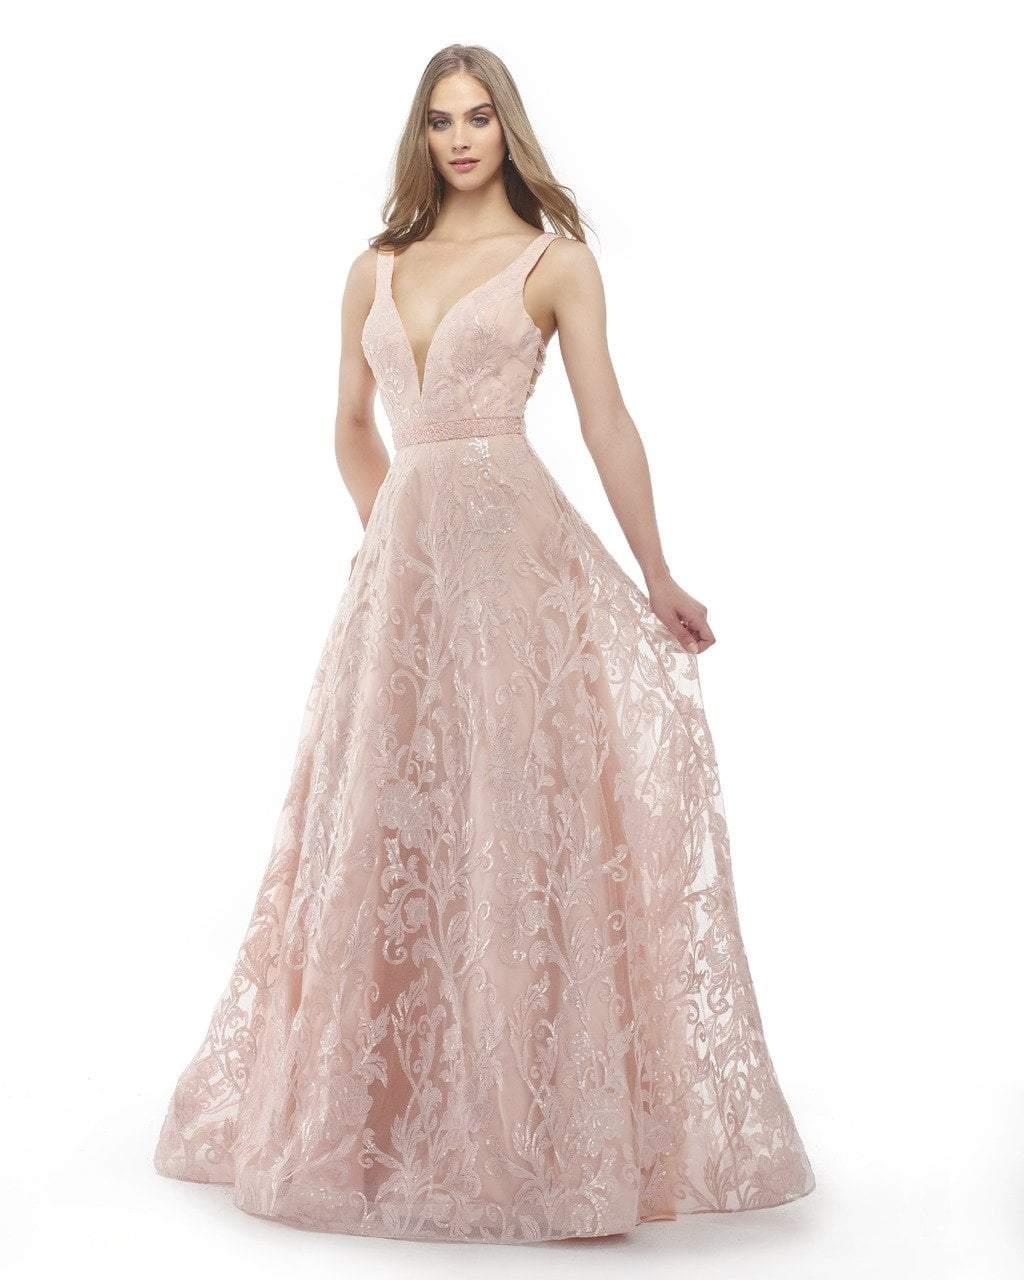 Morrell Maxie - 15825 Embroidered Deep V-neck A-line Dress